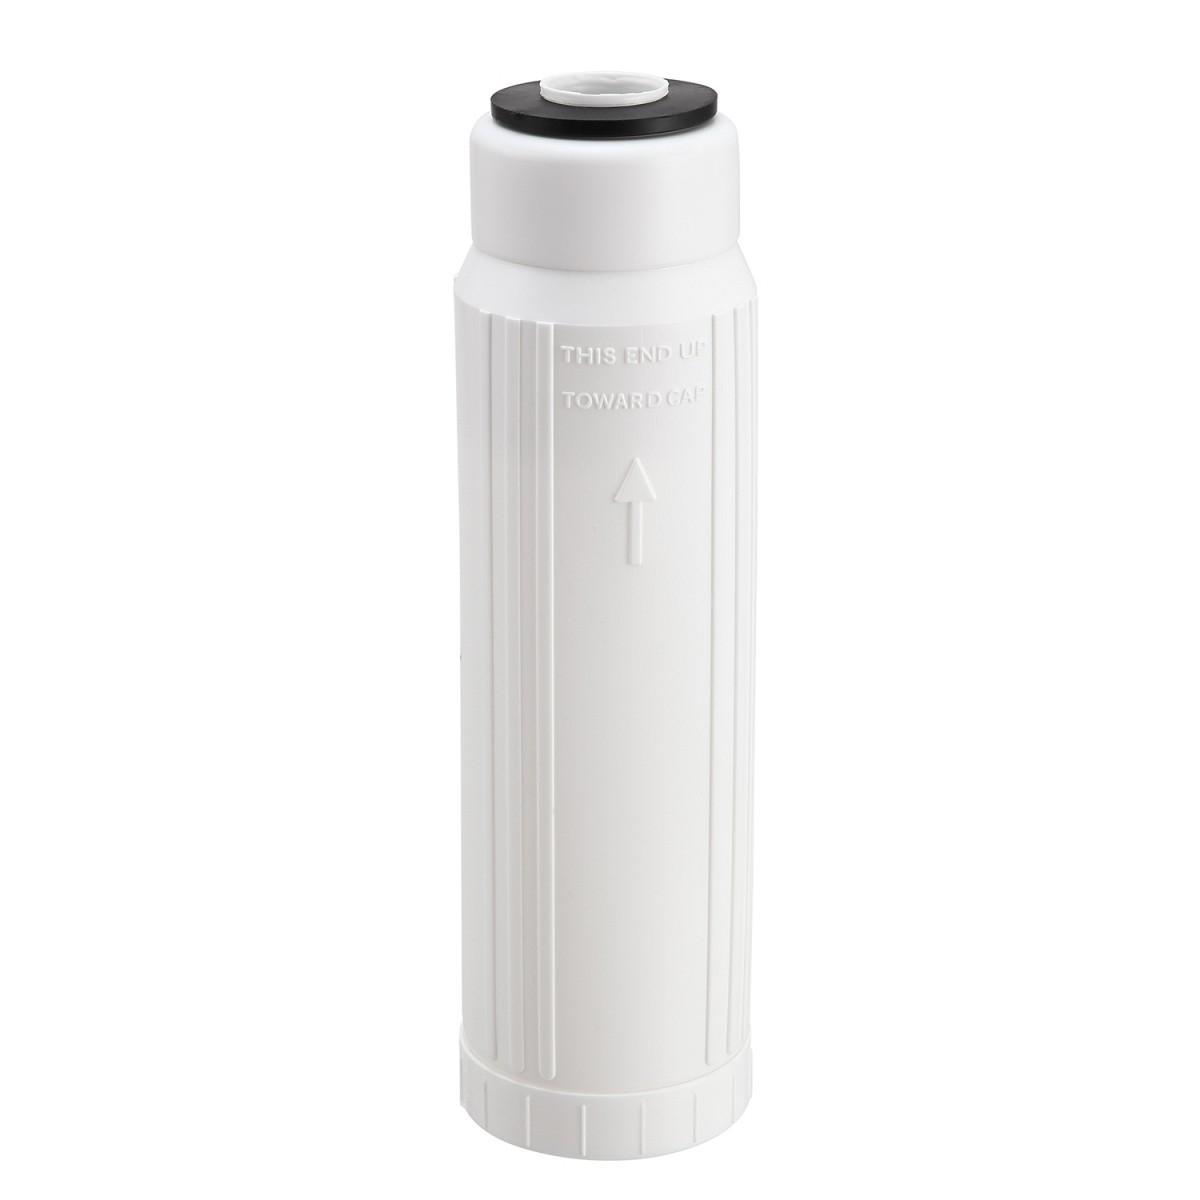 Cartucho Recarregável para elementos filtrantes